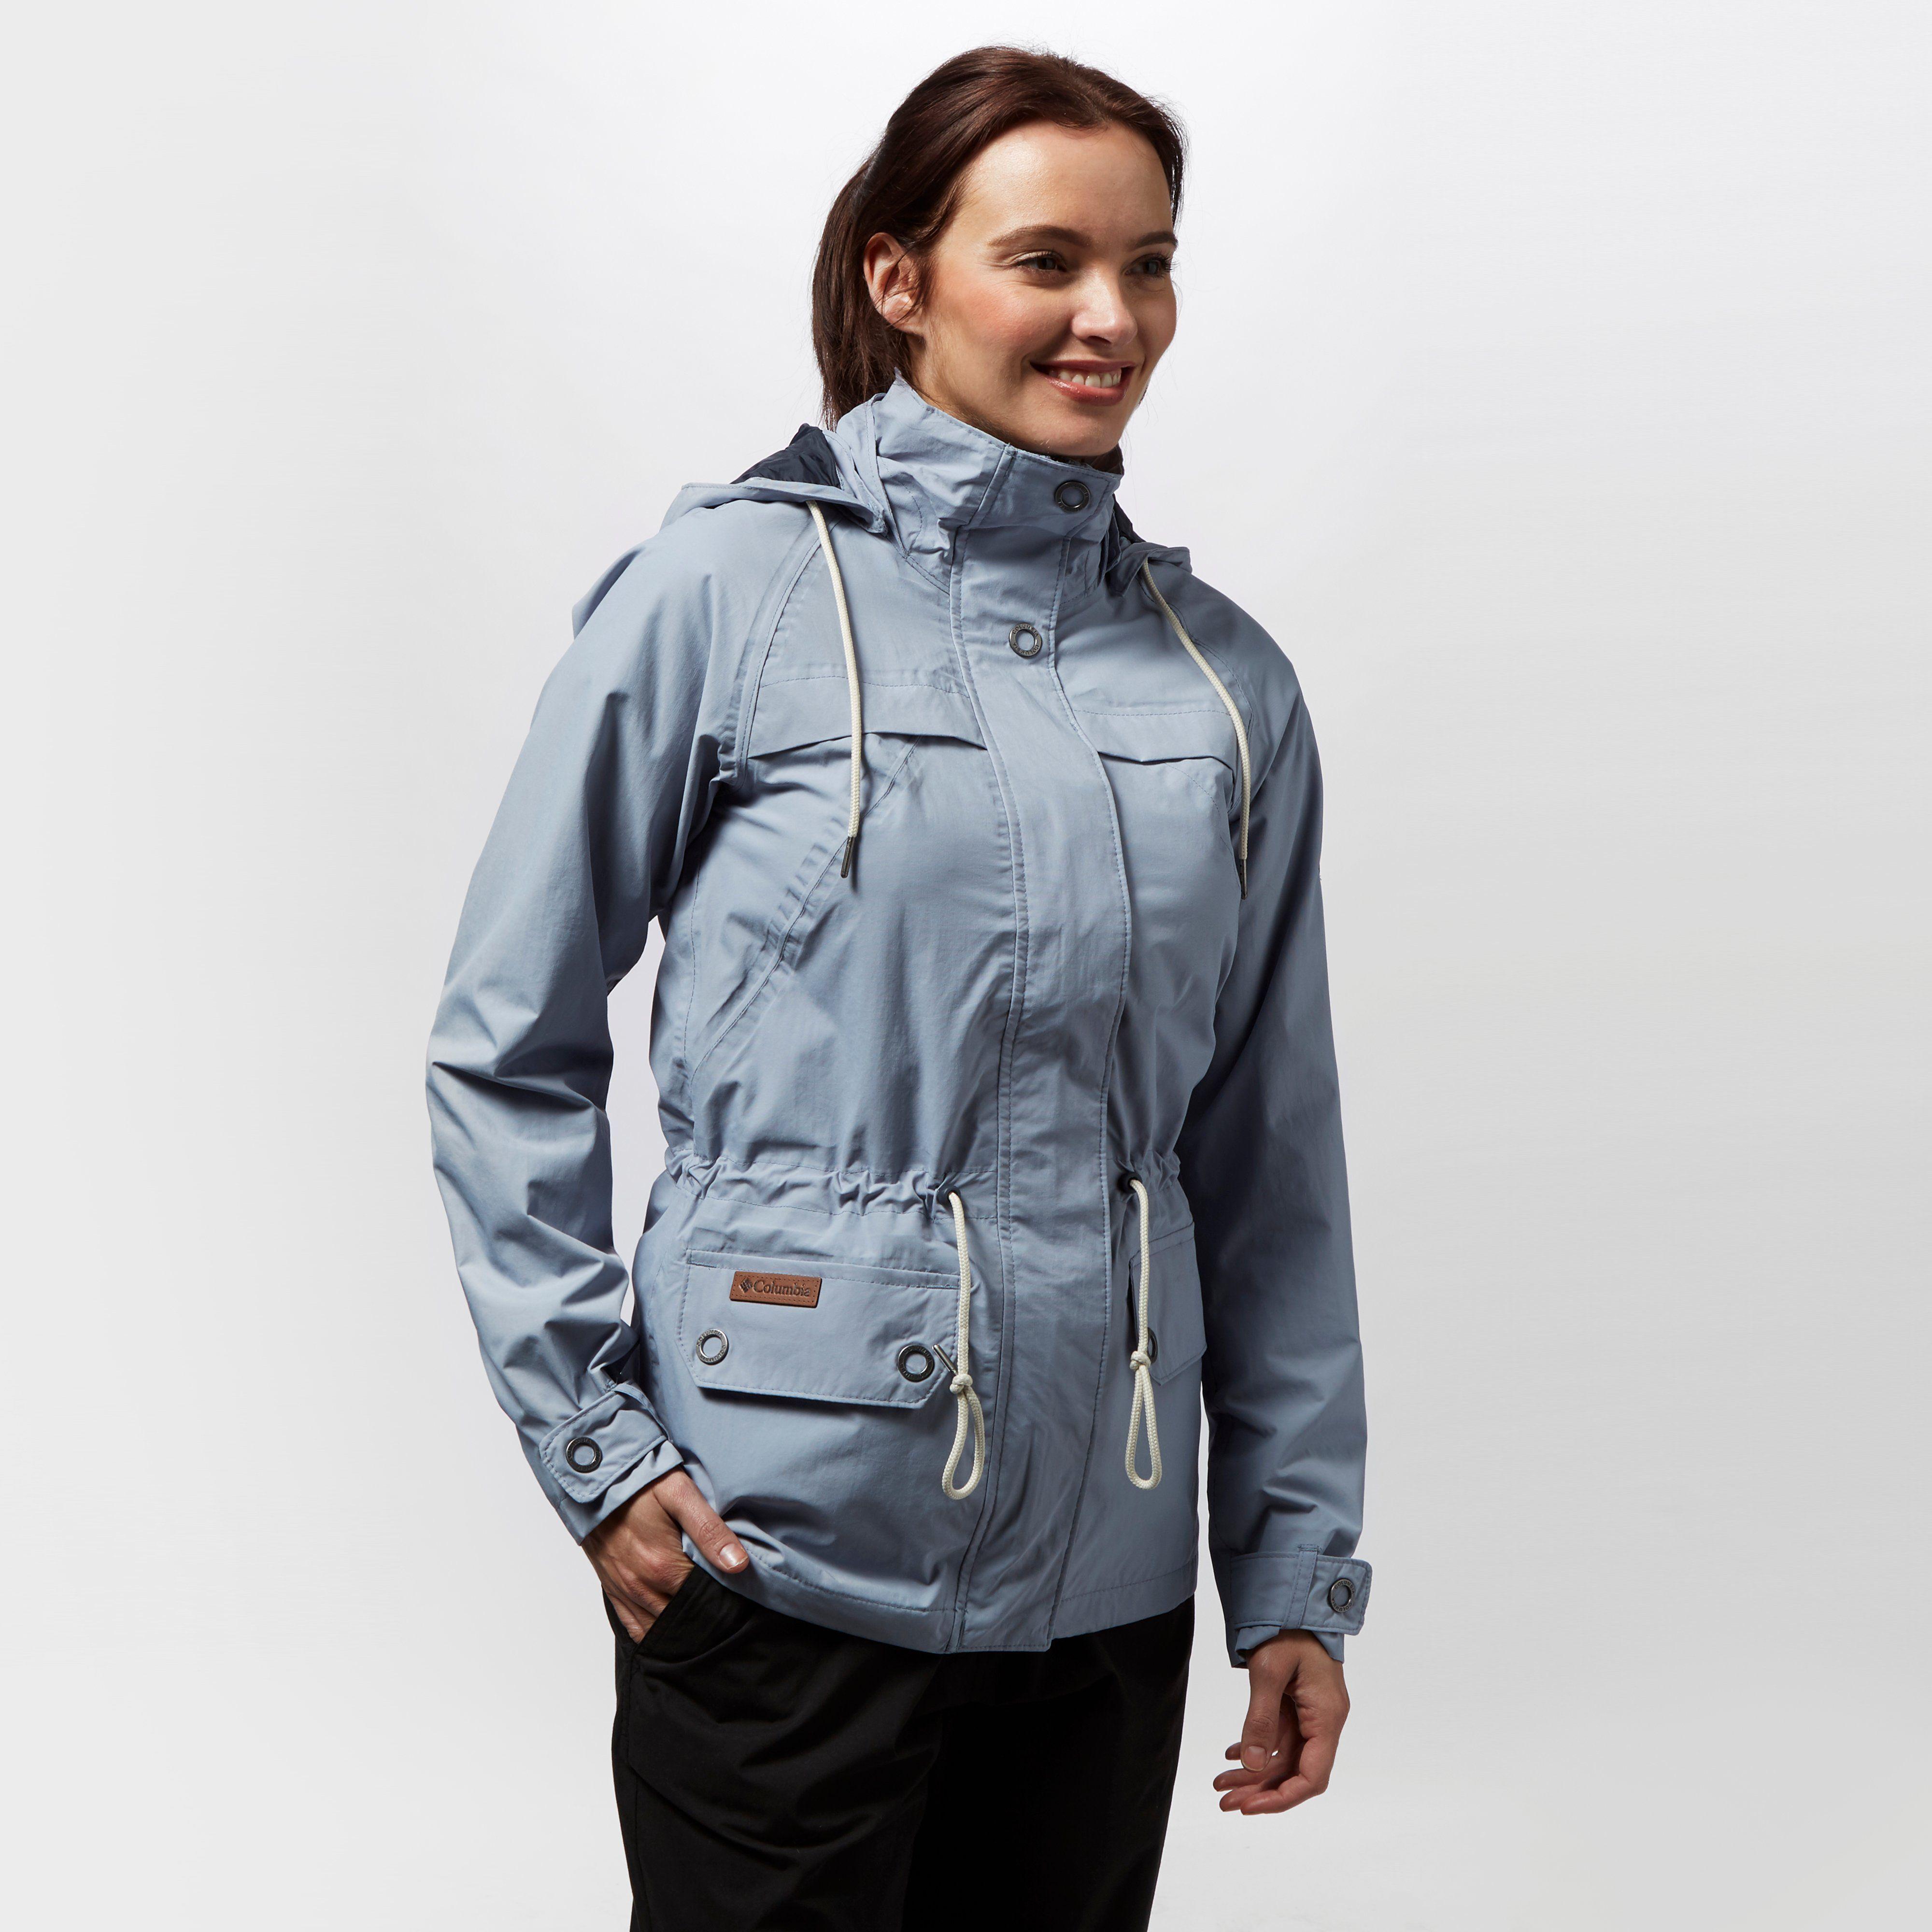 COLUMBIA Women's Remoteness Jacket